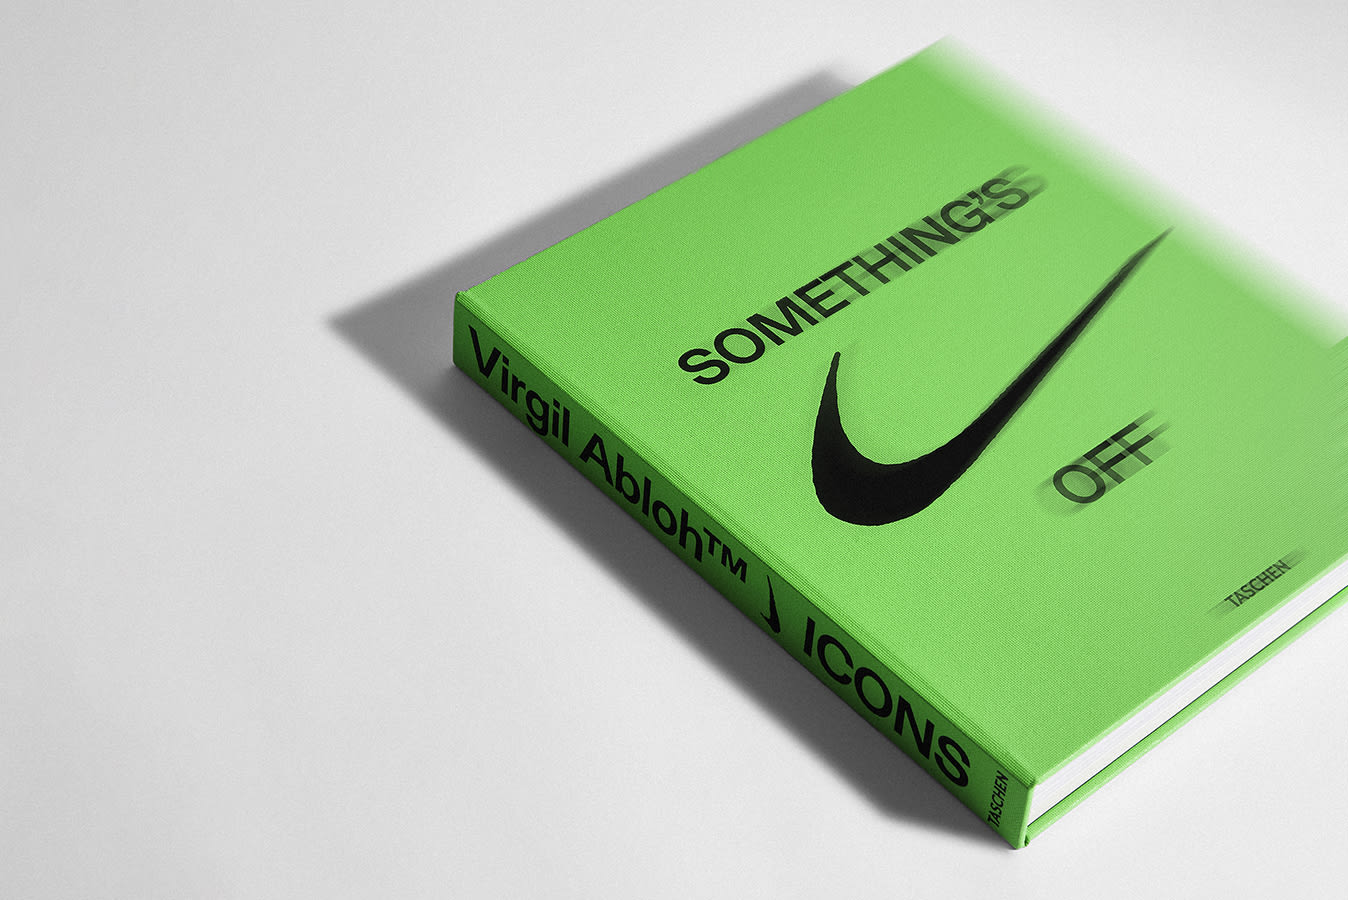 Nike. ICONS By Virgil Abloh - 978-3-8365-8509-5